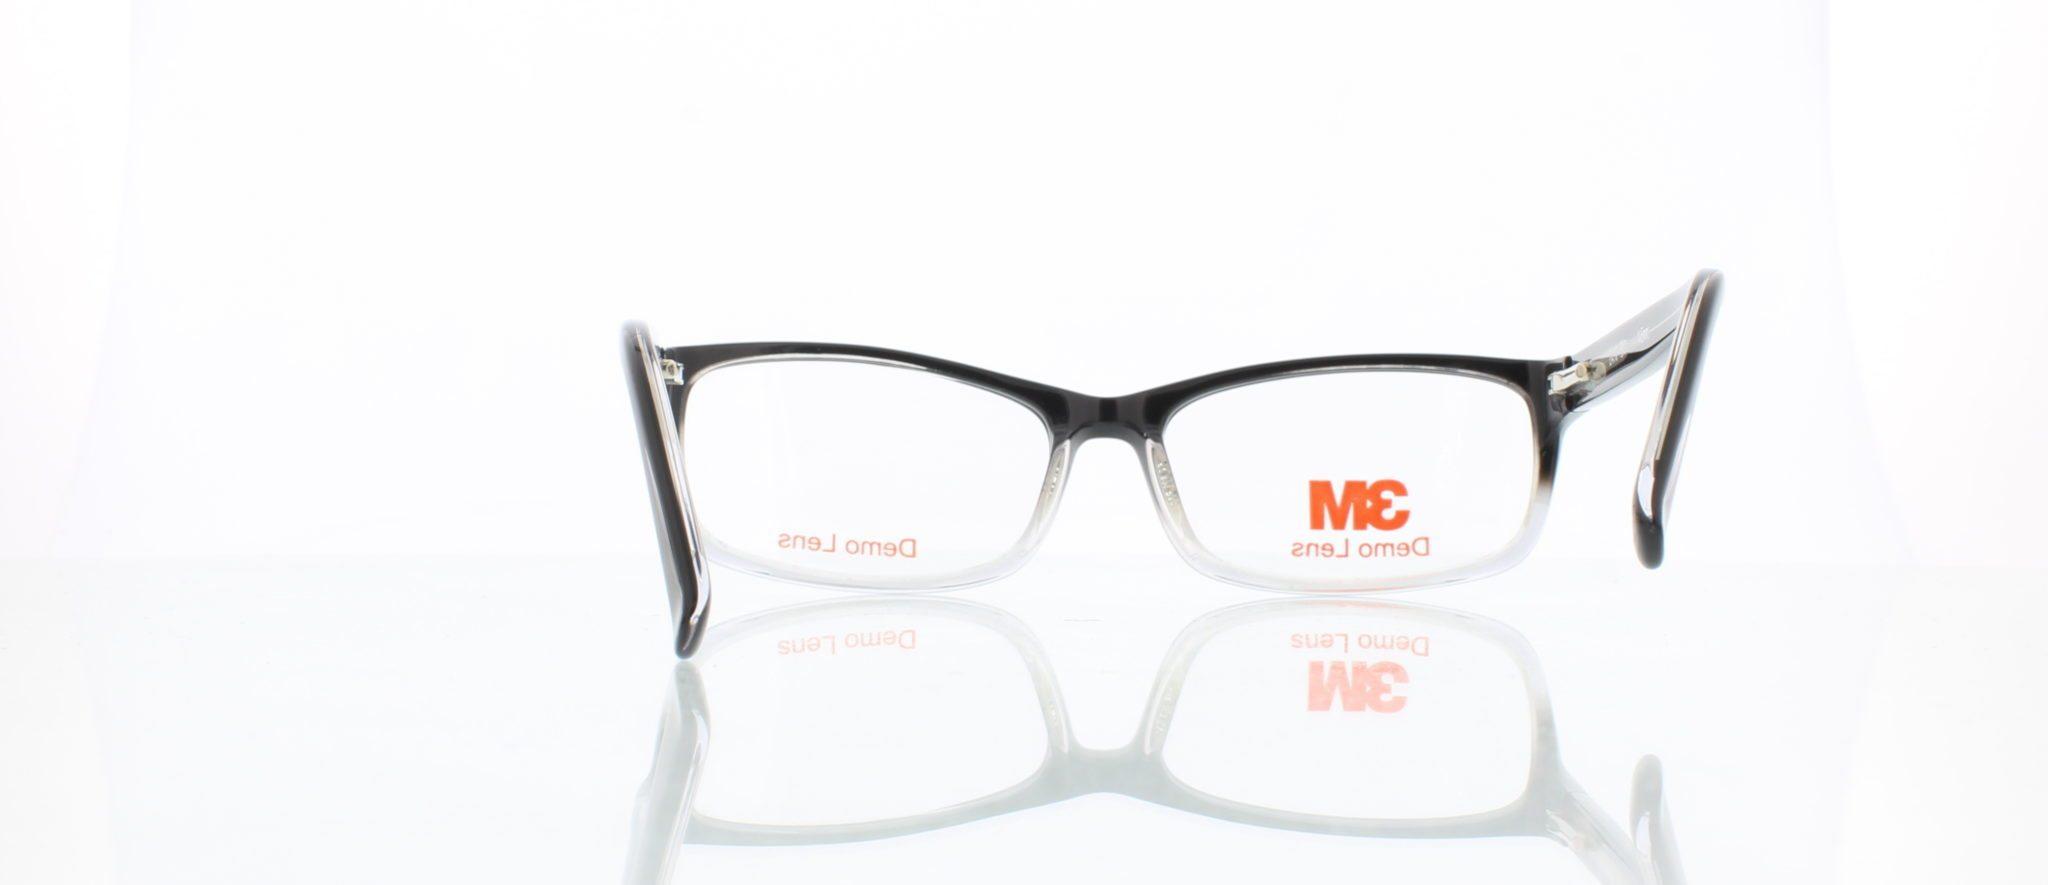 3m D490 Safety Glasses